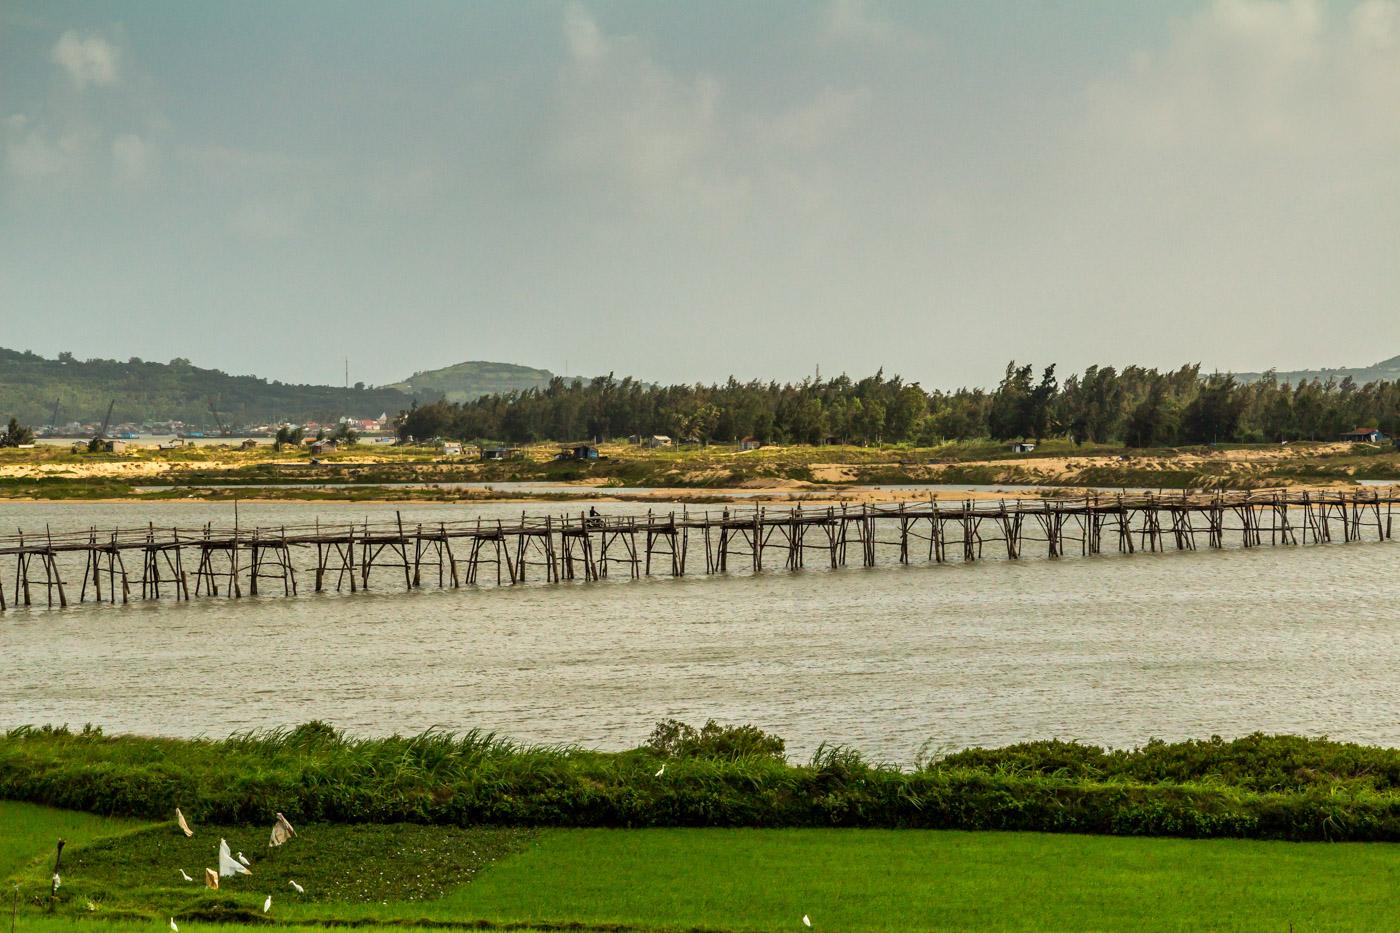 Motorbikes drove across a scenic bridge.